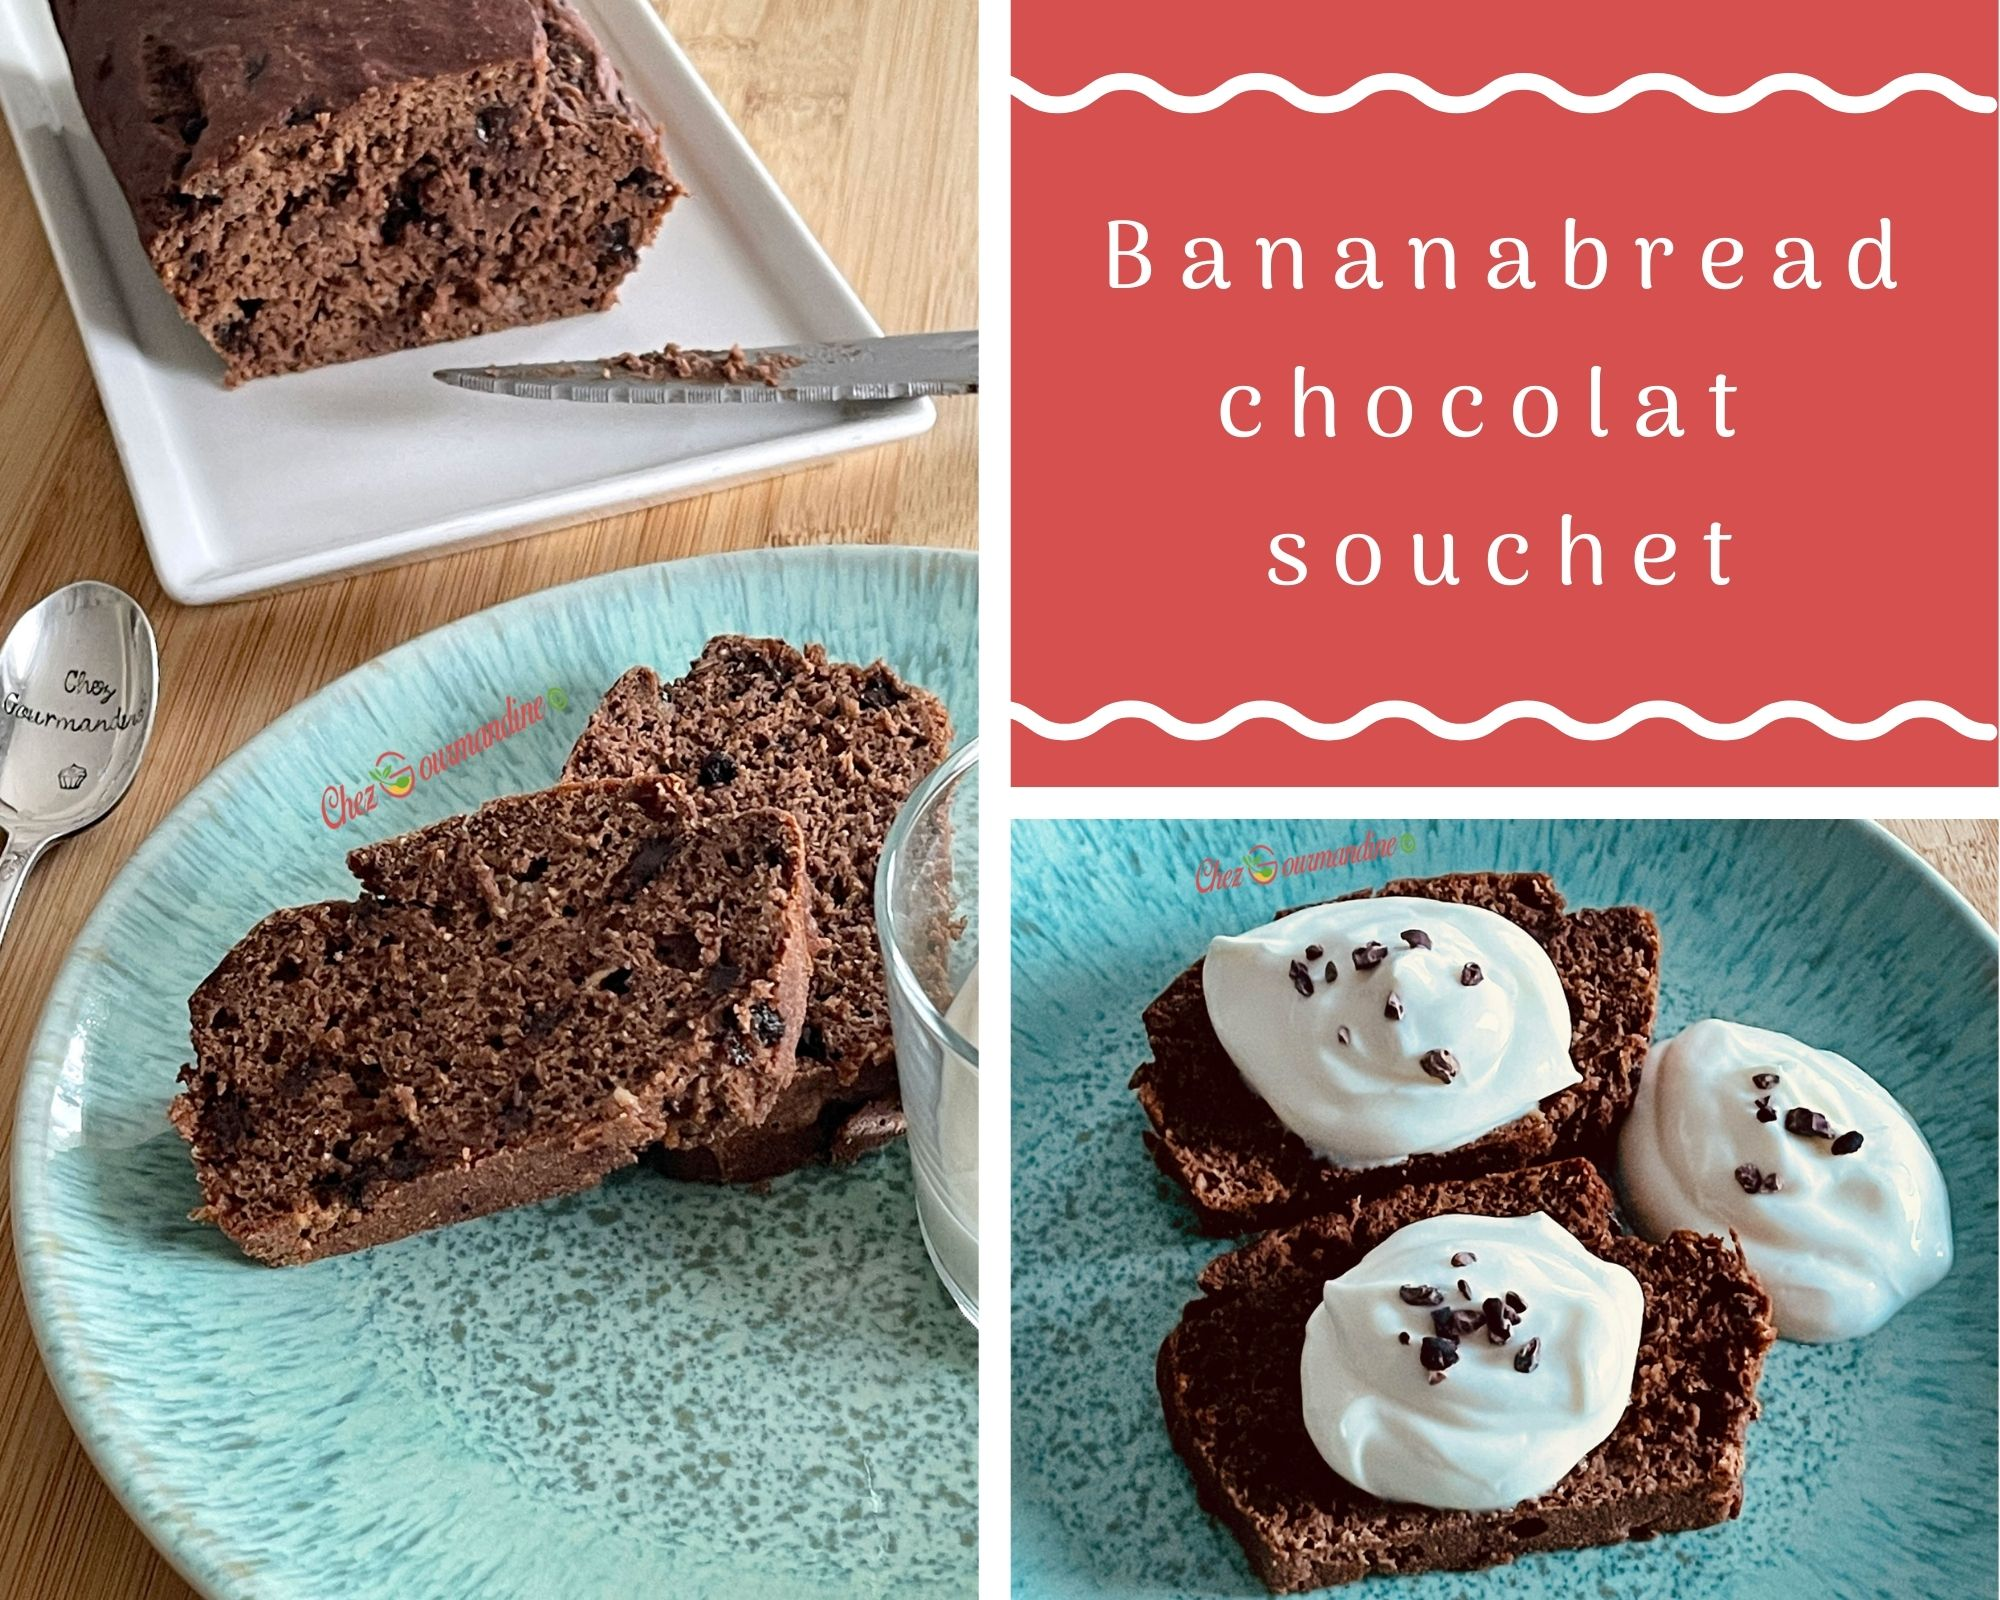 Bananabread chocolat souchet